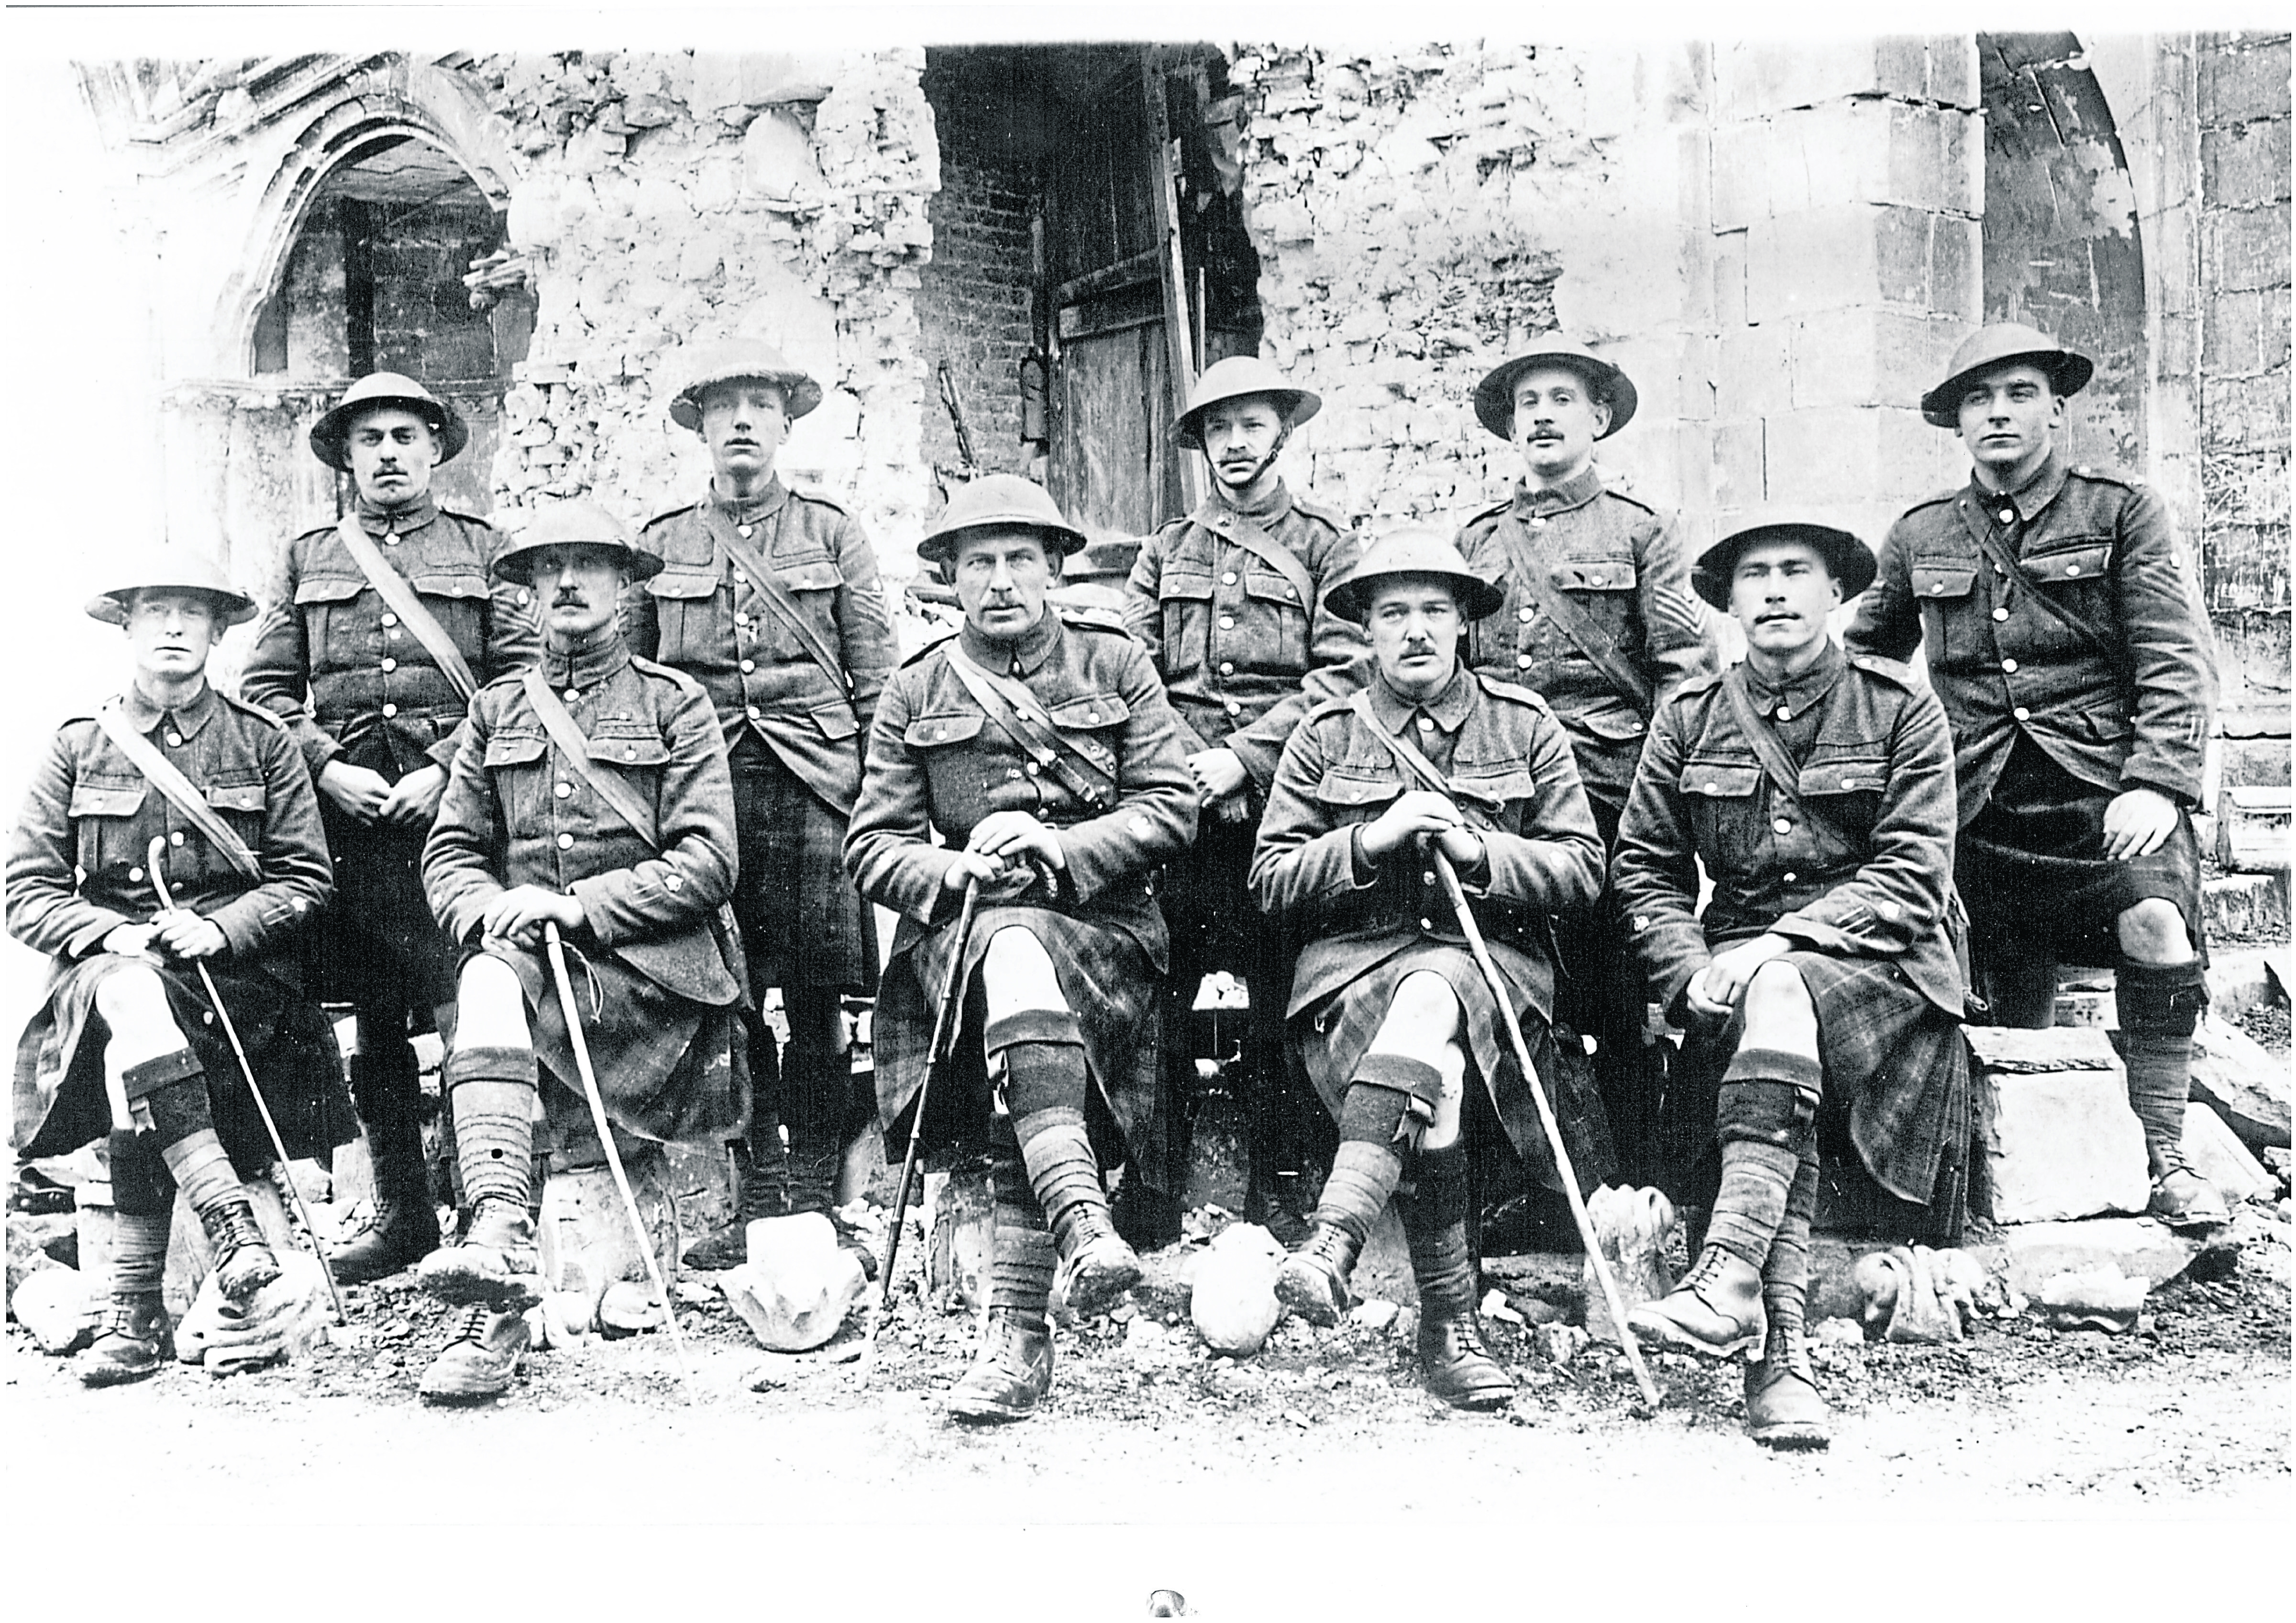 1st Battalion Gordon Highlanders Warrant Officers at Arras.